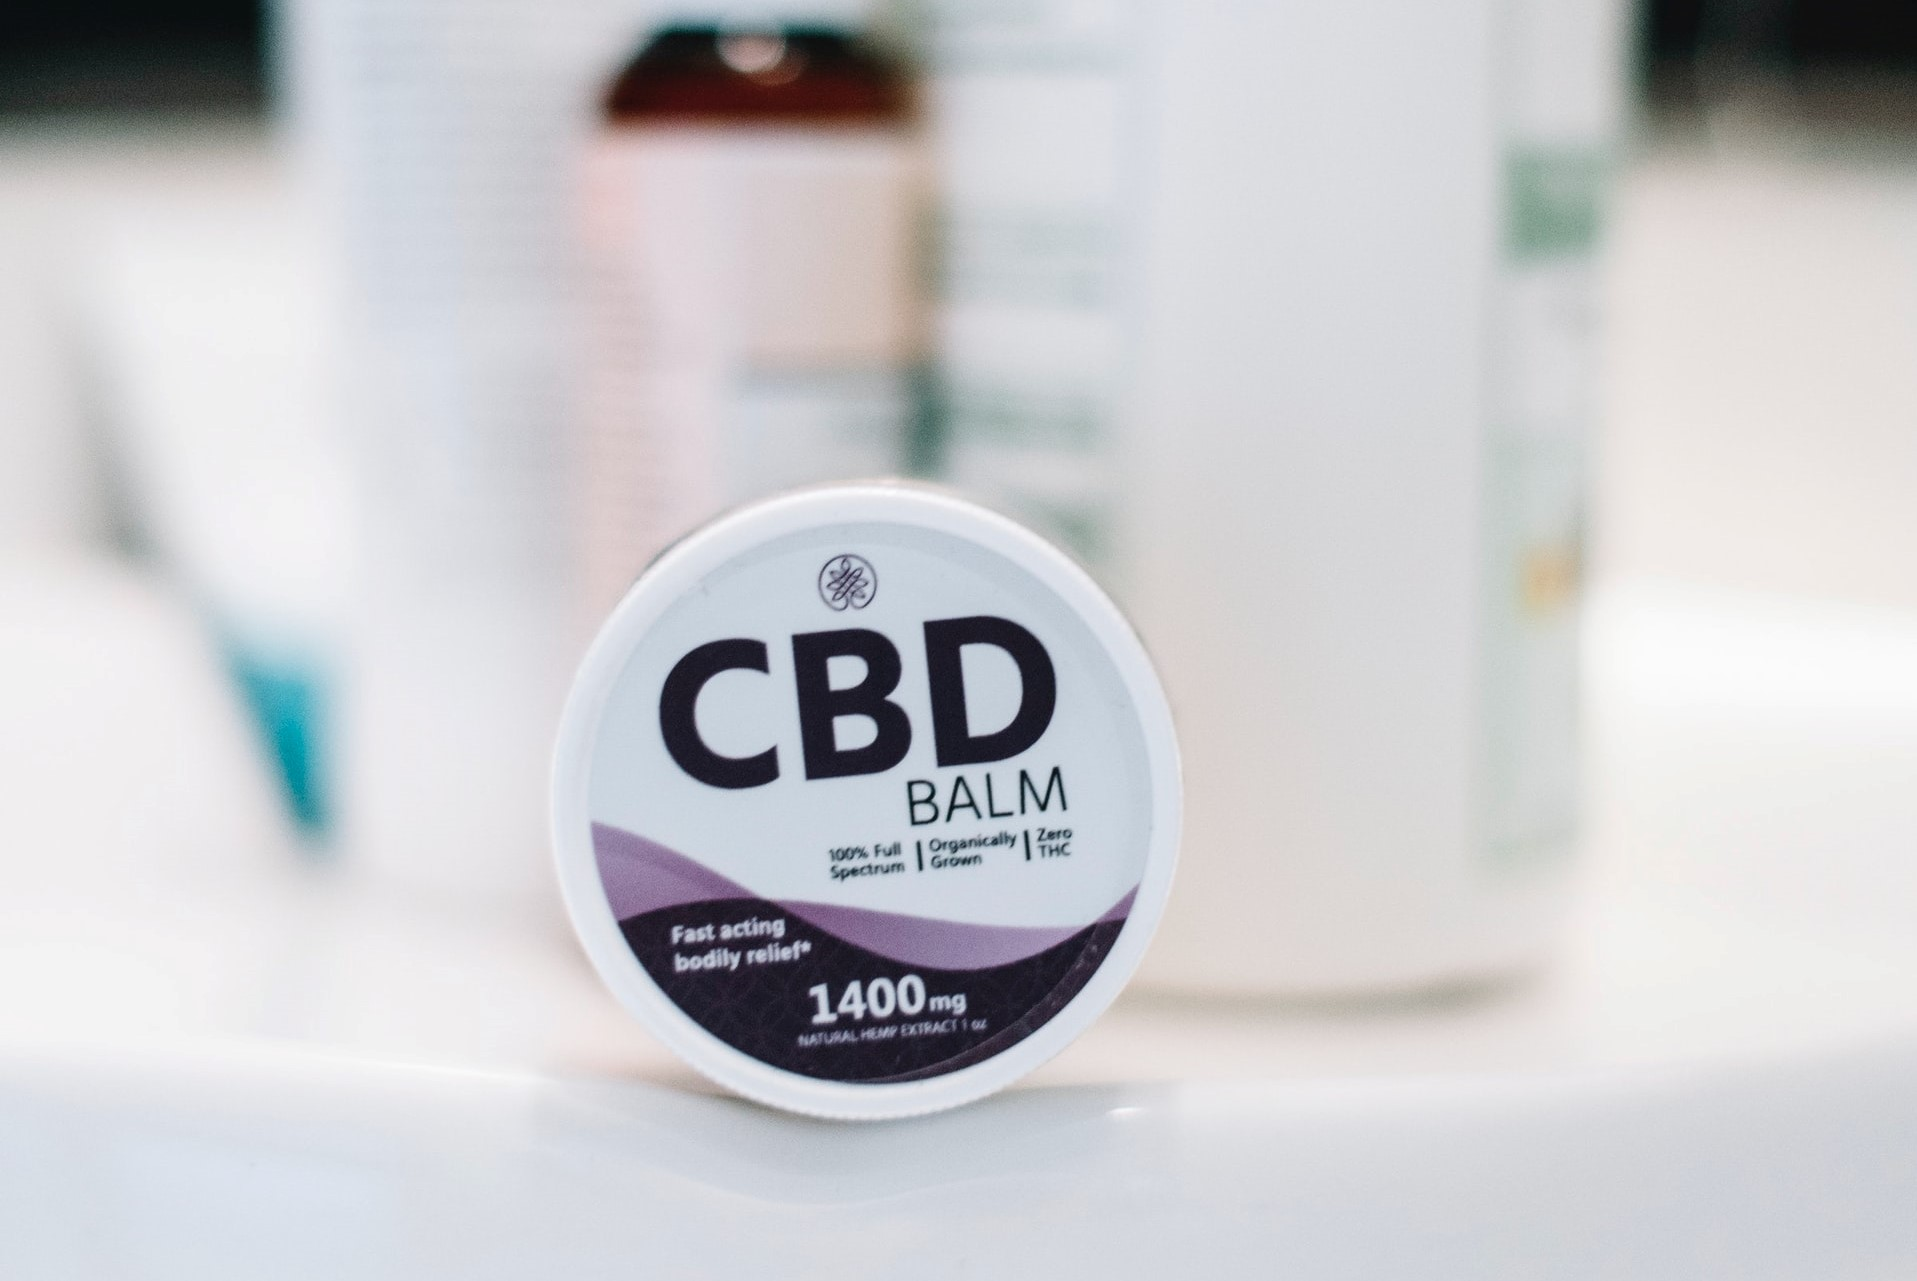 CBD balm container